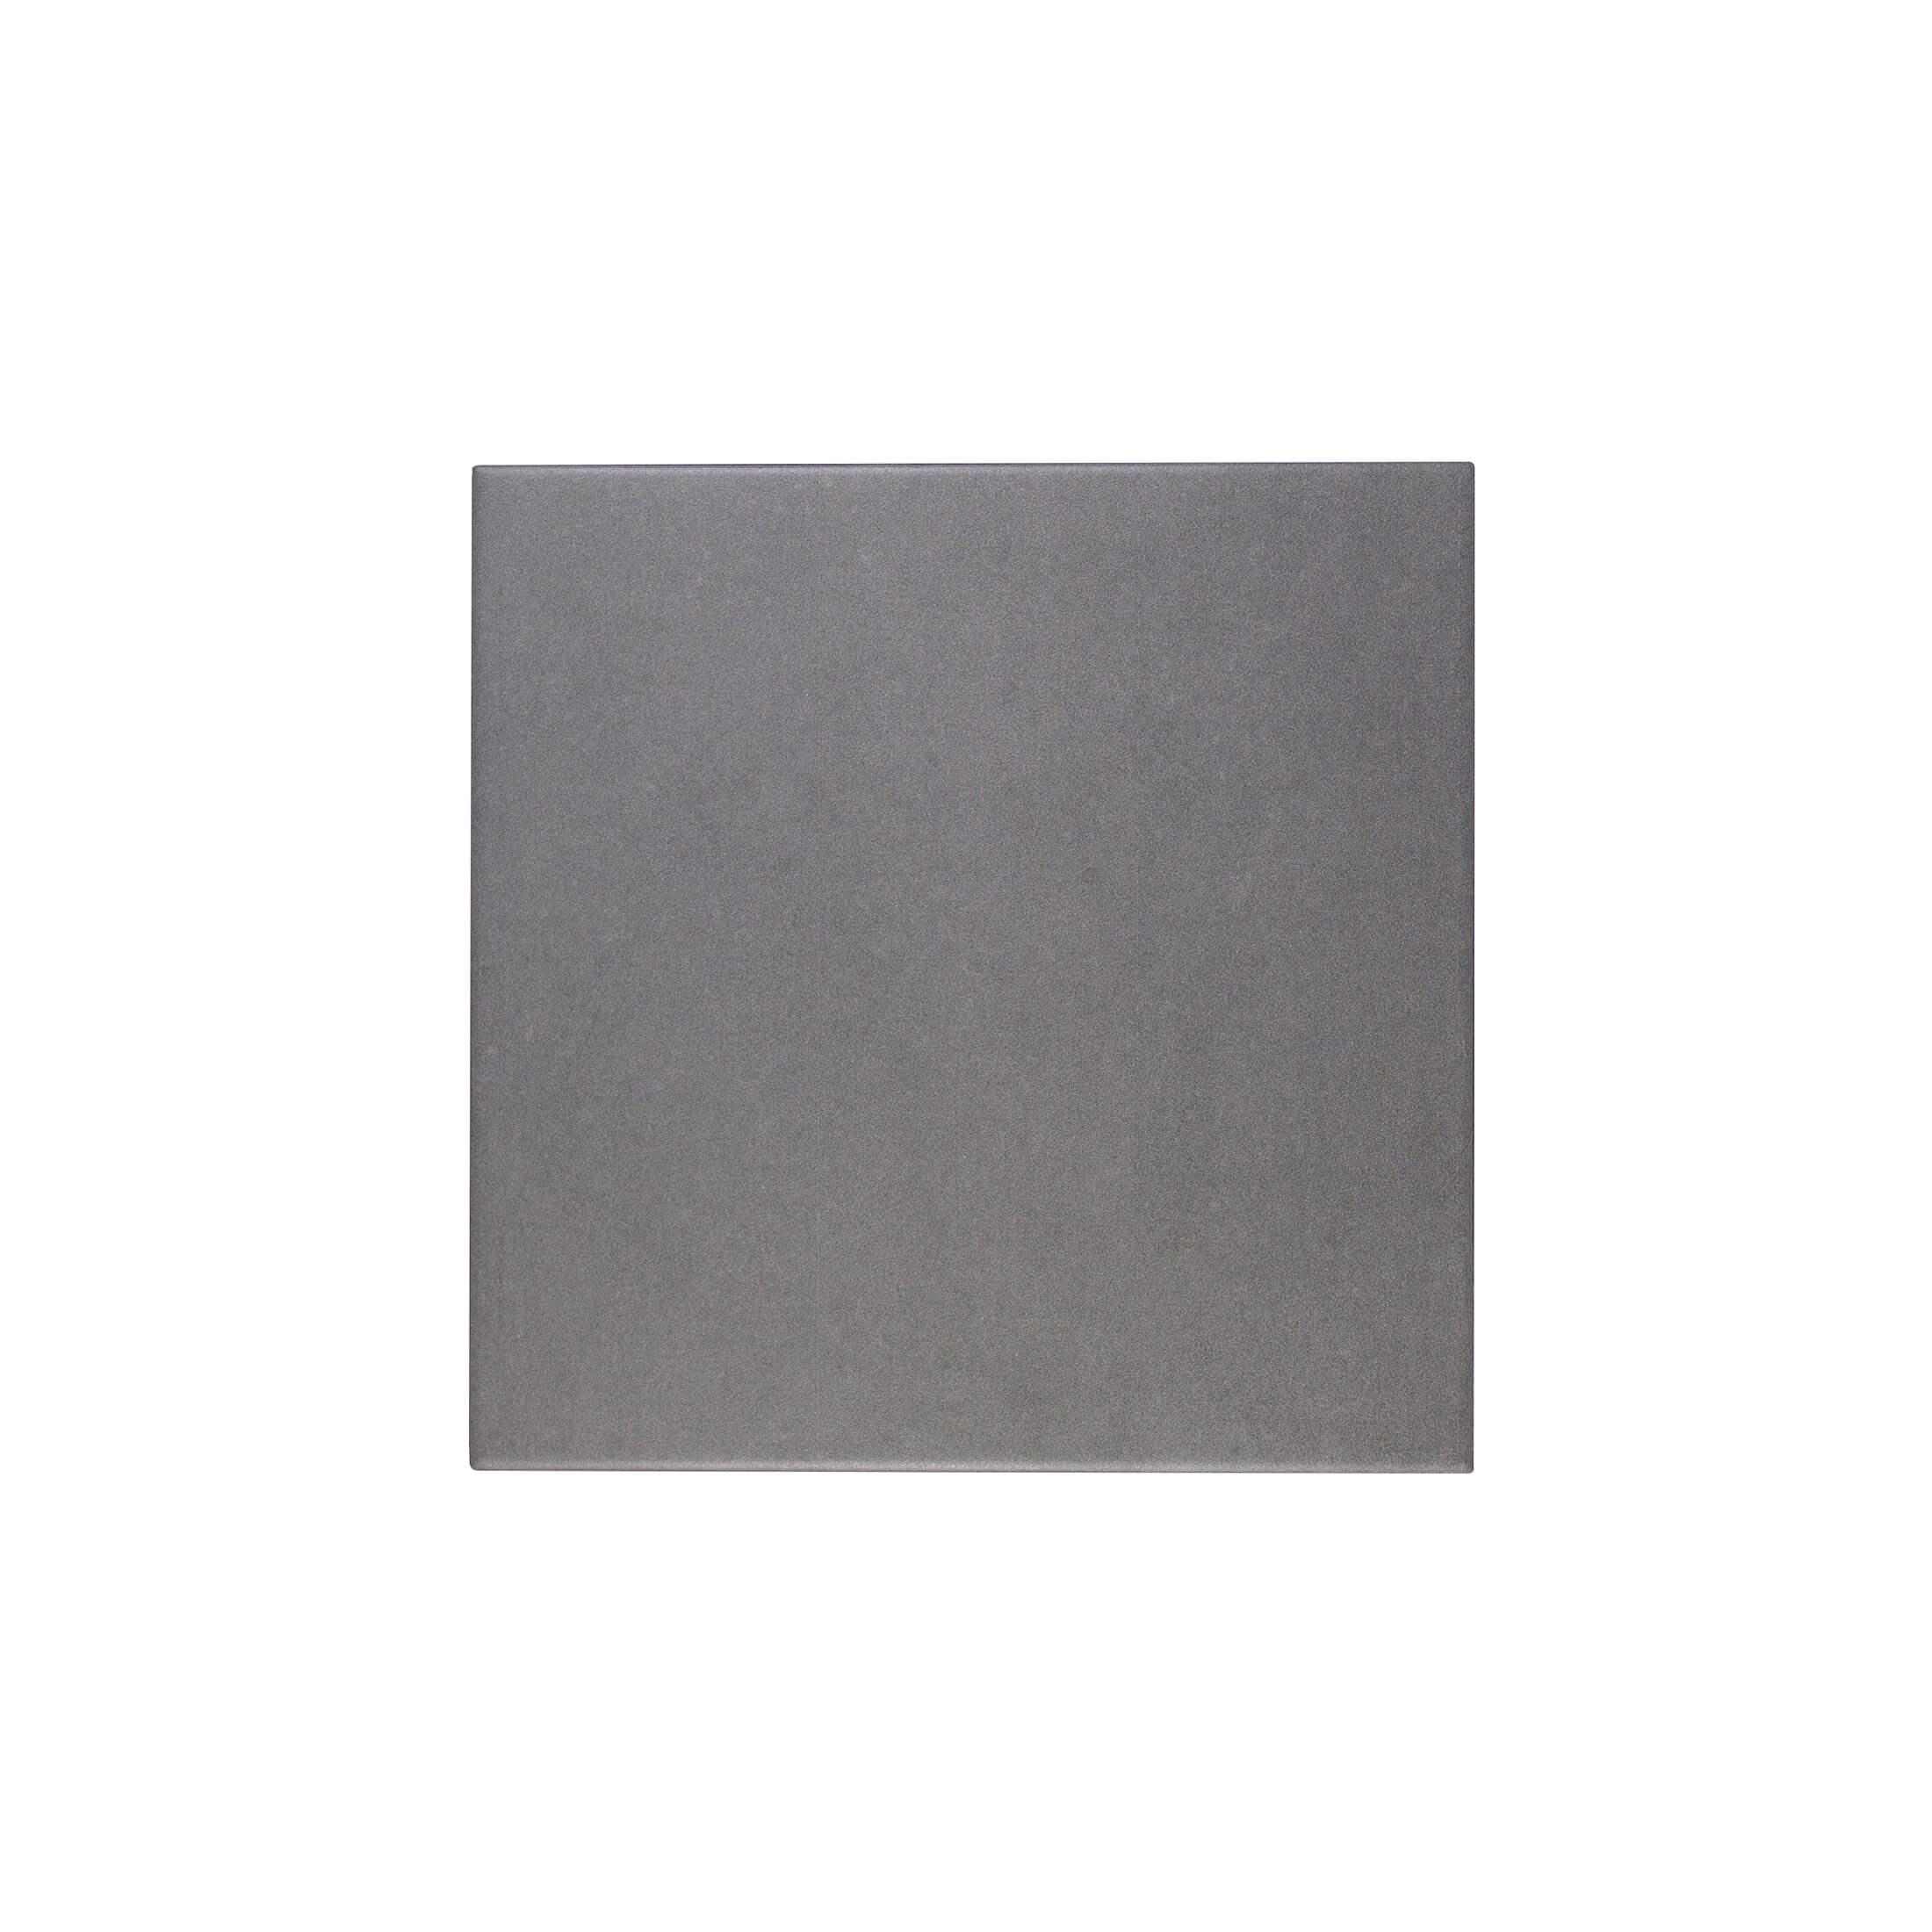 ADPV9024 - PAVIMENTO DARK GRAY - 18.5 cm X 18.5 cm